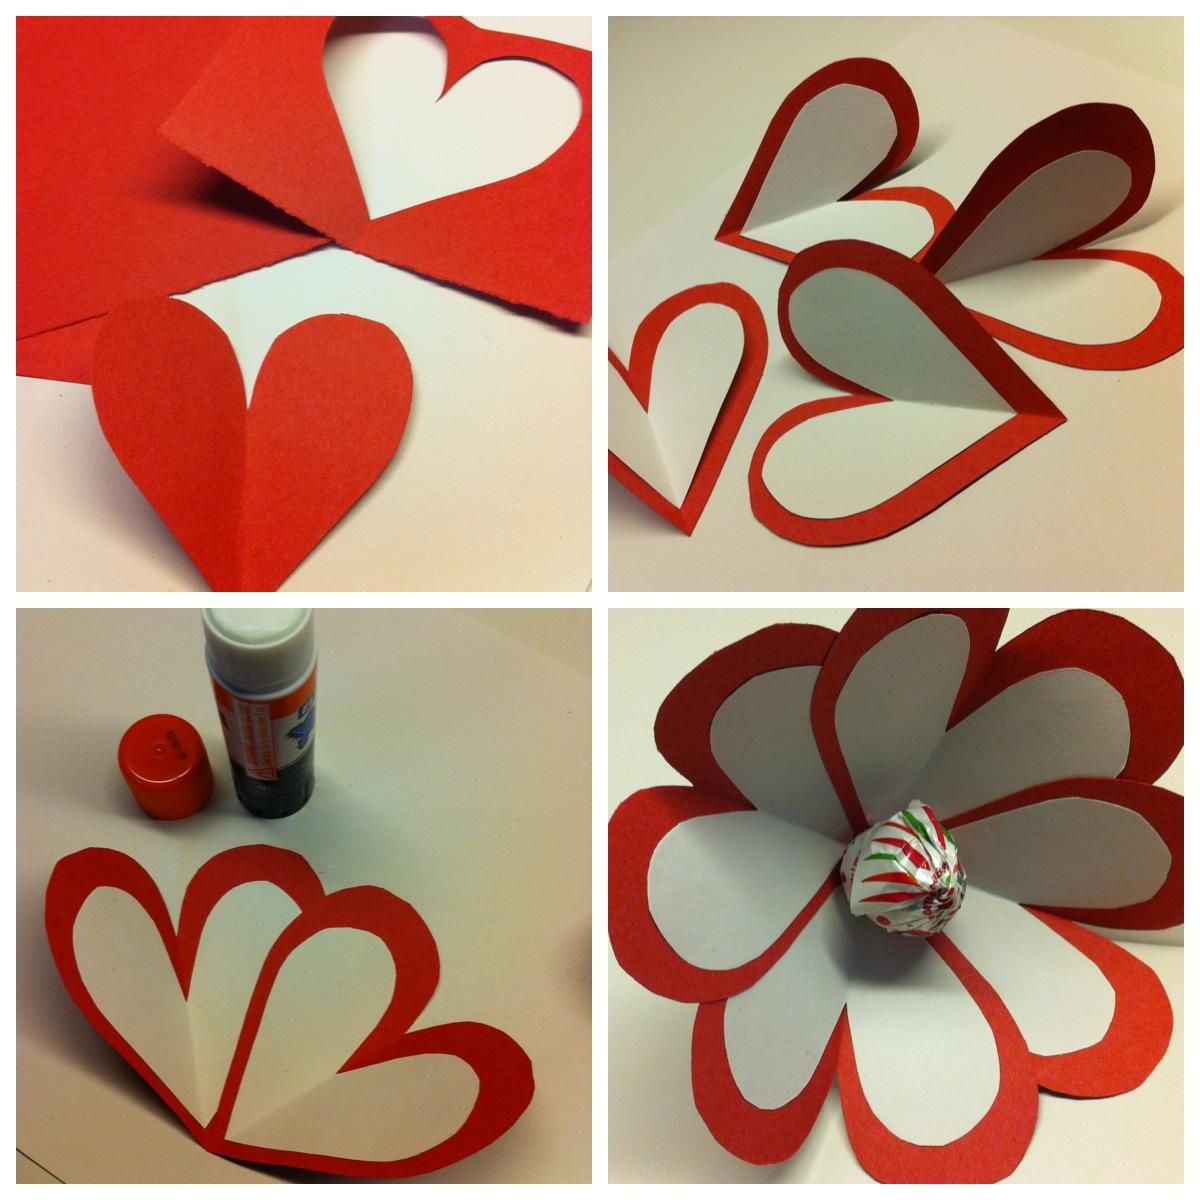 Valentine Day: Free Romantic Cards 2014